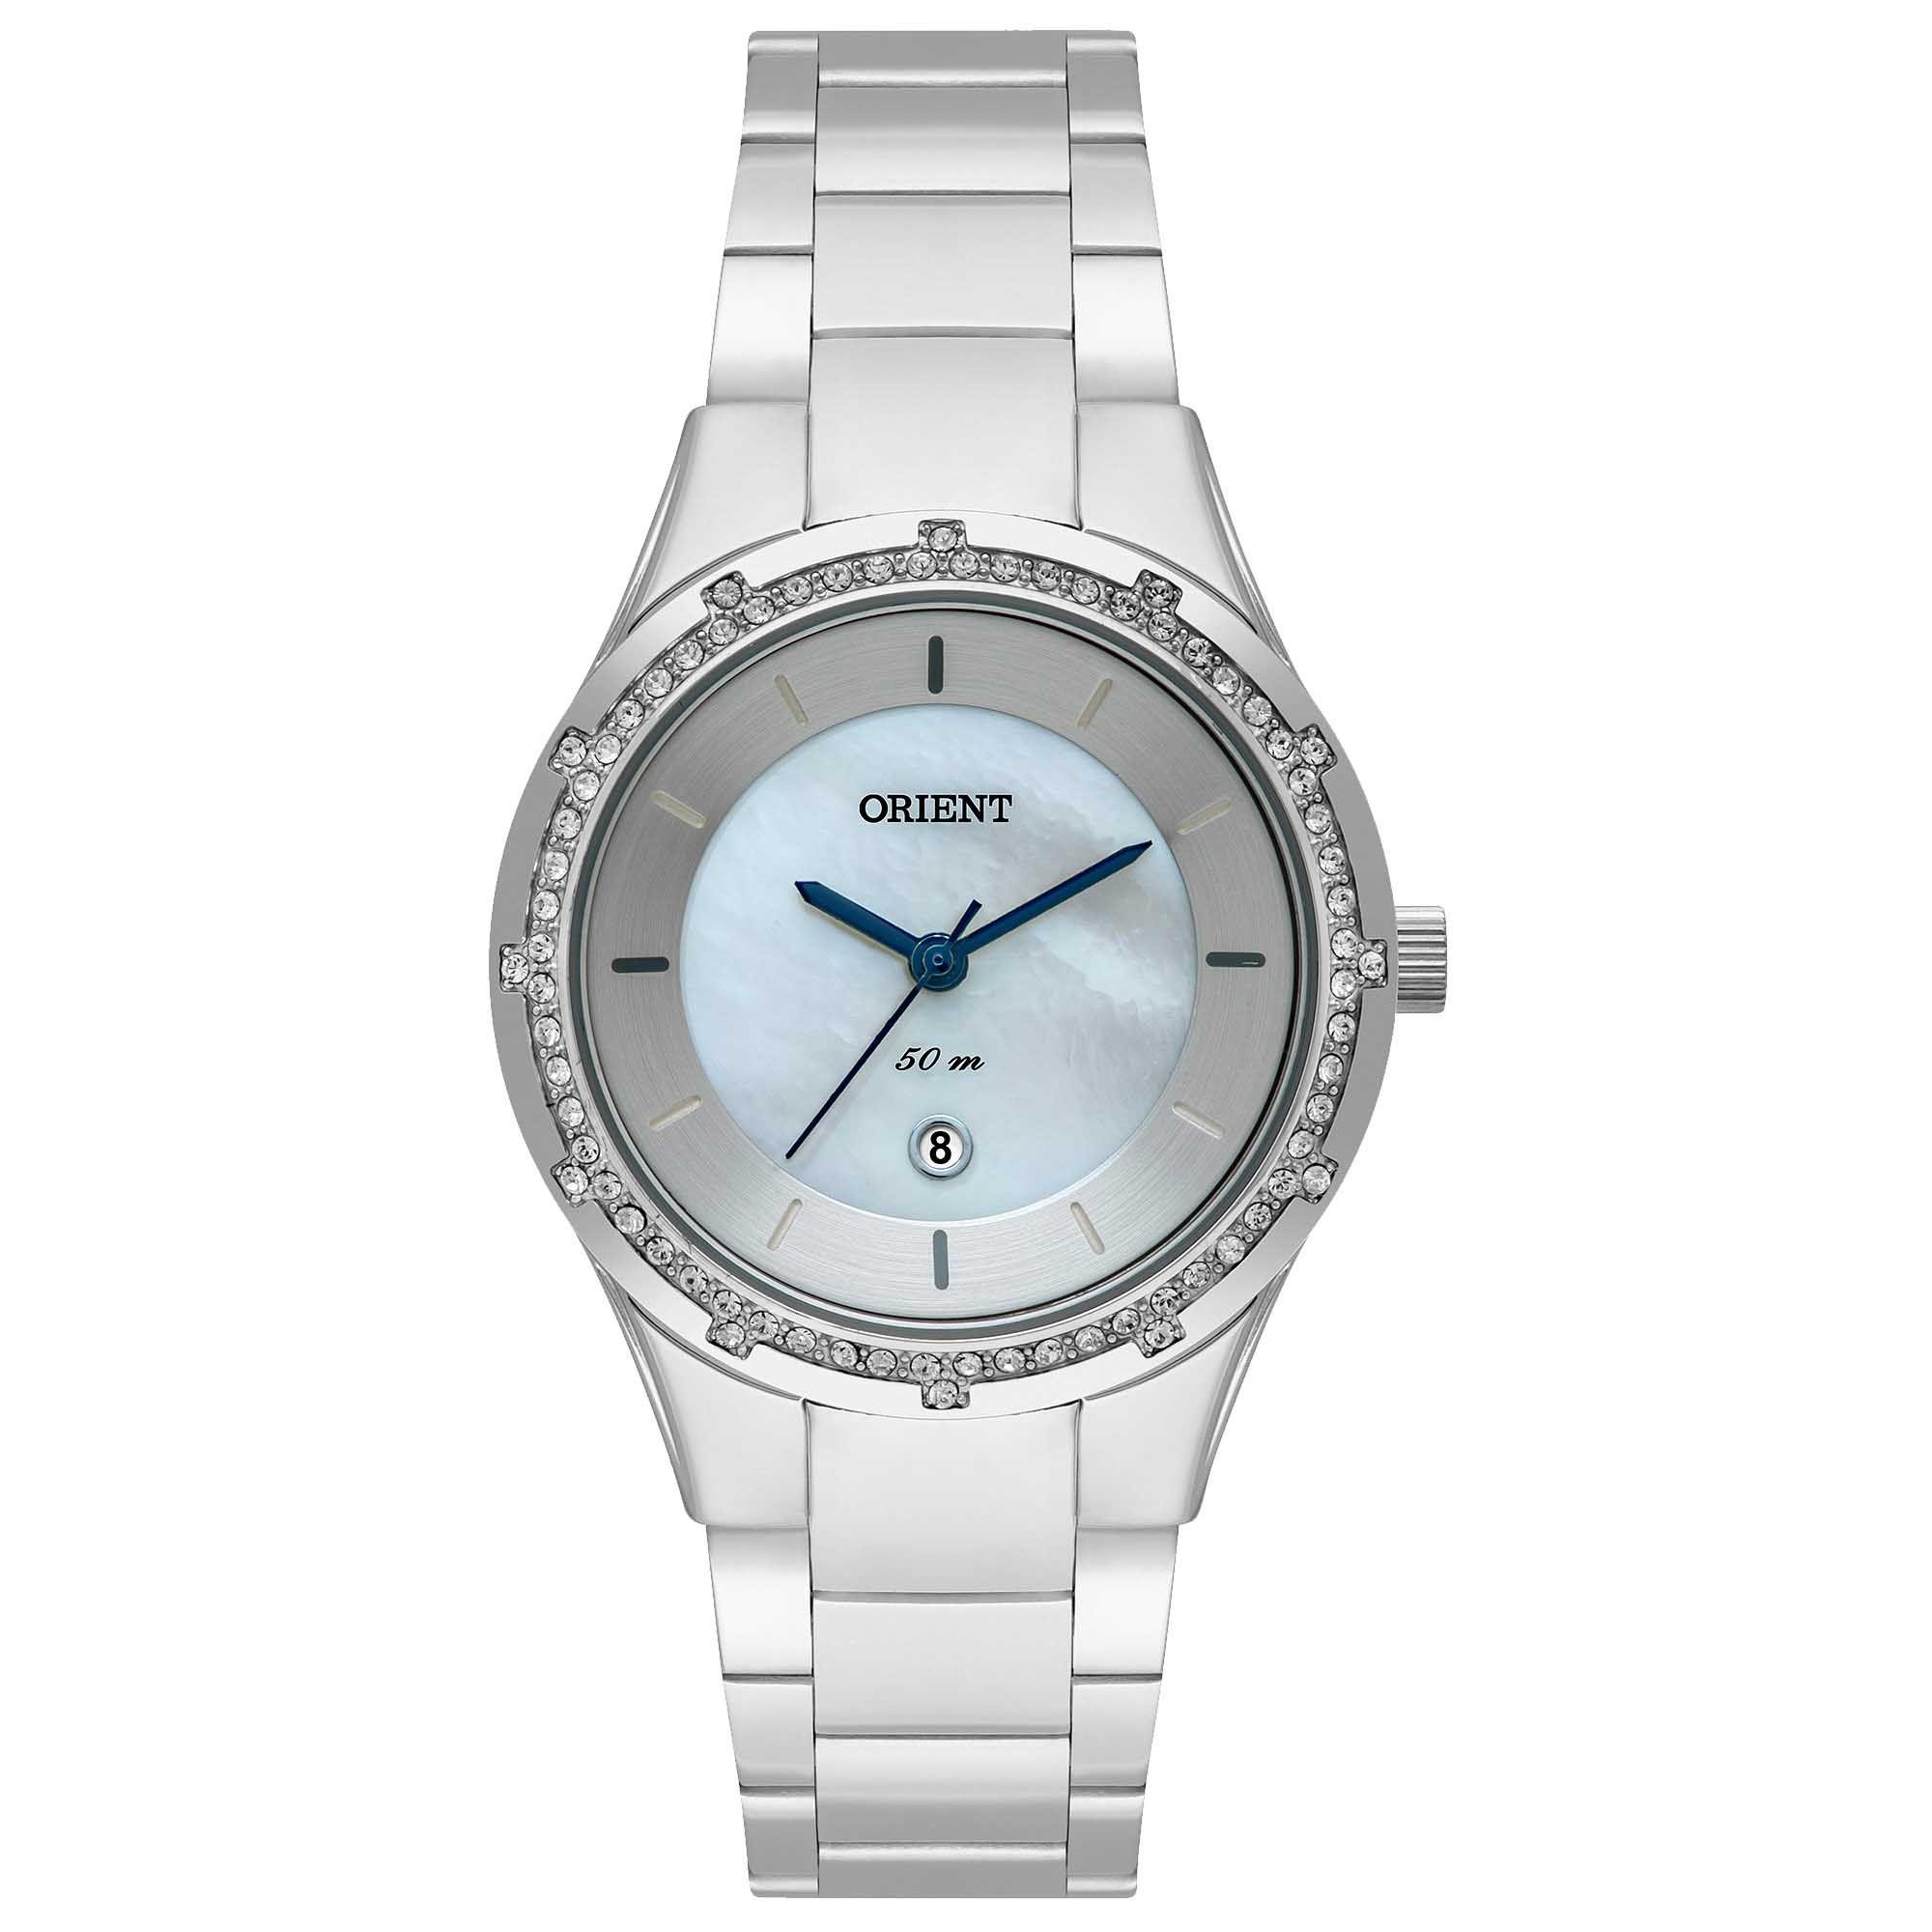 Relógio Feminino Orient FBSS1148 B1SX